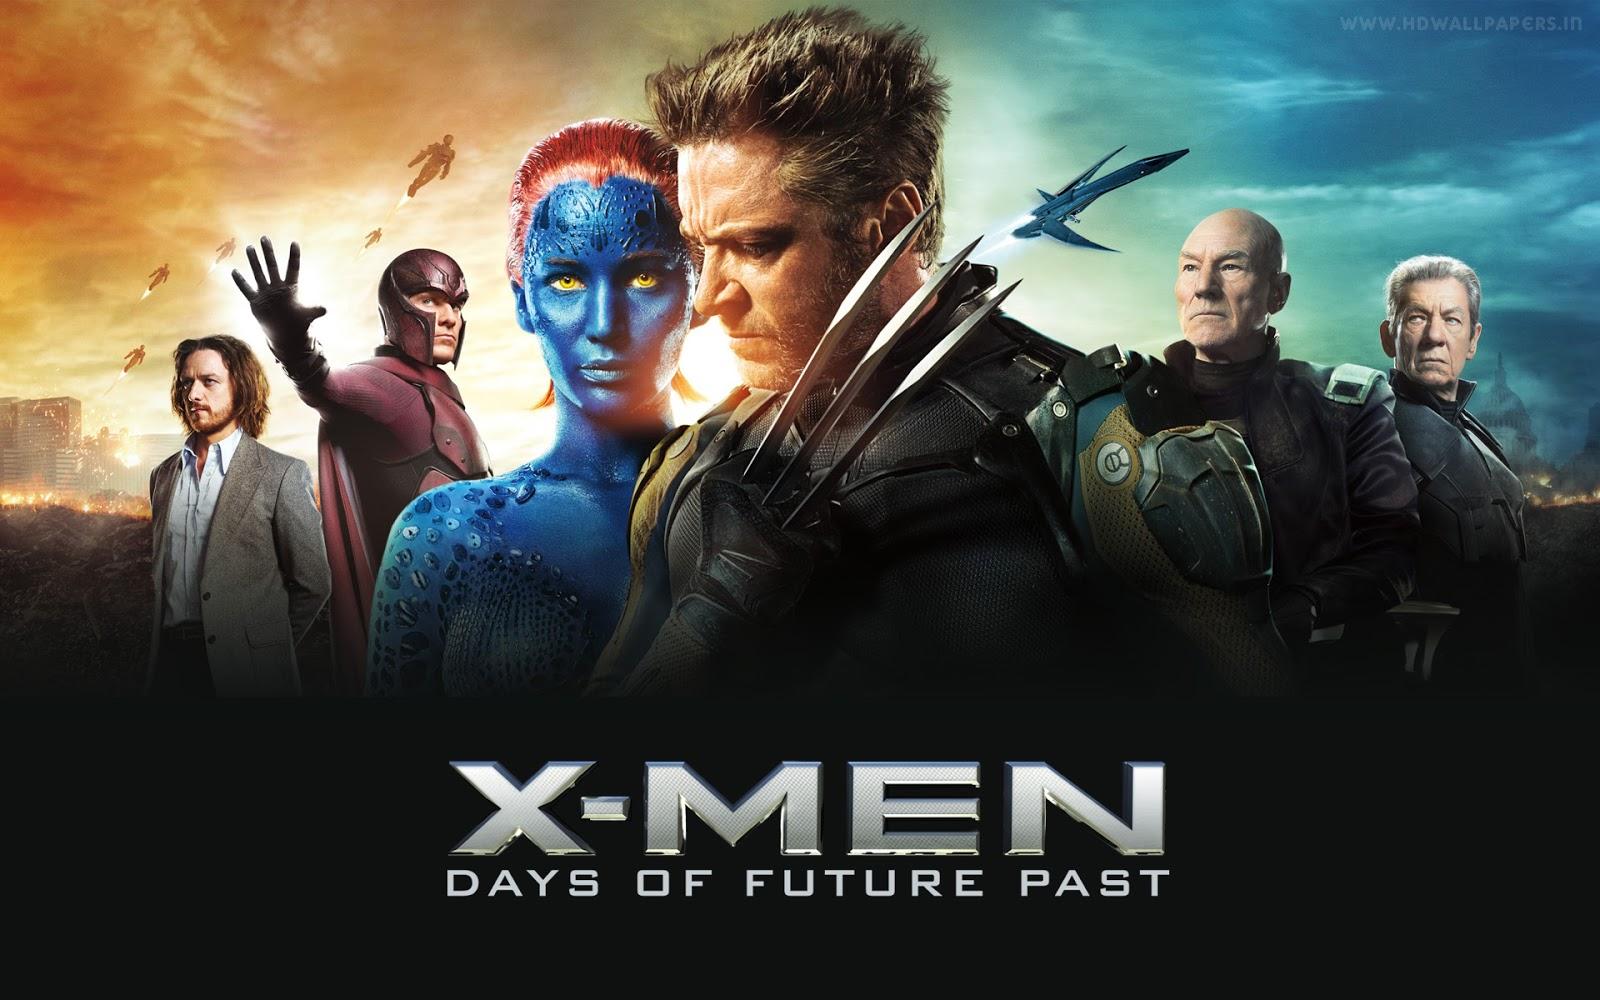 Download X-Men: Days of Future Past (2014) BluRay 720p Subtitle Indonesia